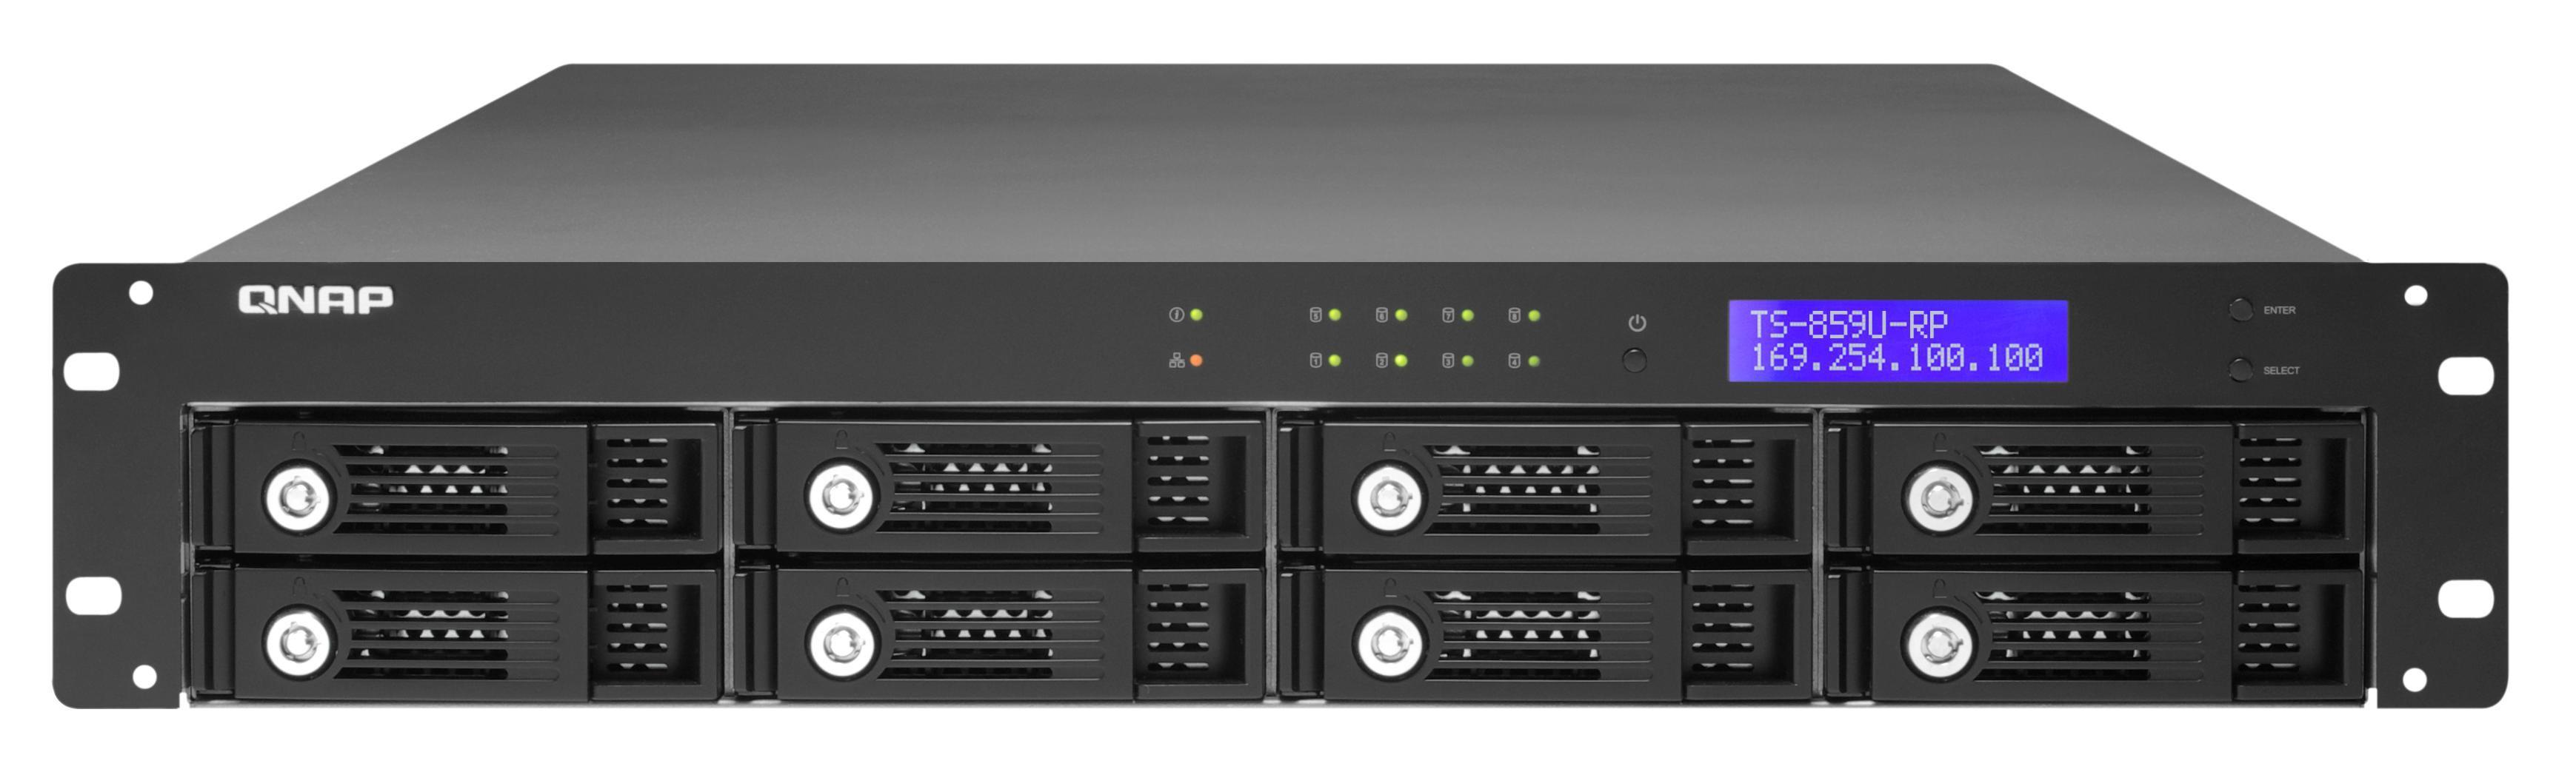 QNAP TS-859U-RP - QNAP TS-859U-RP Rack [2U] storage server